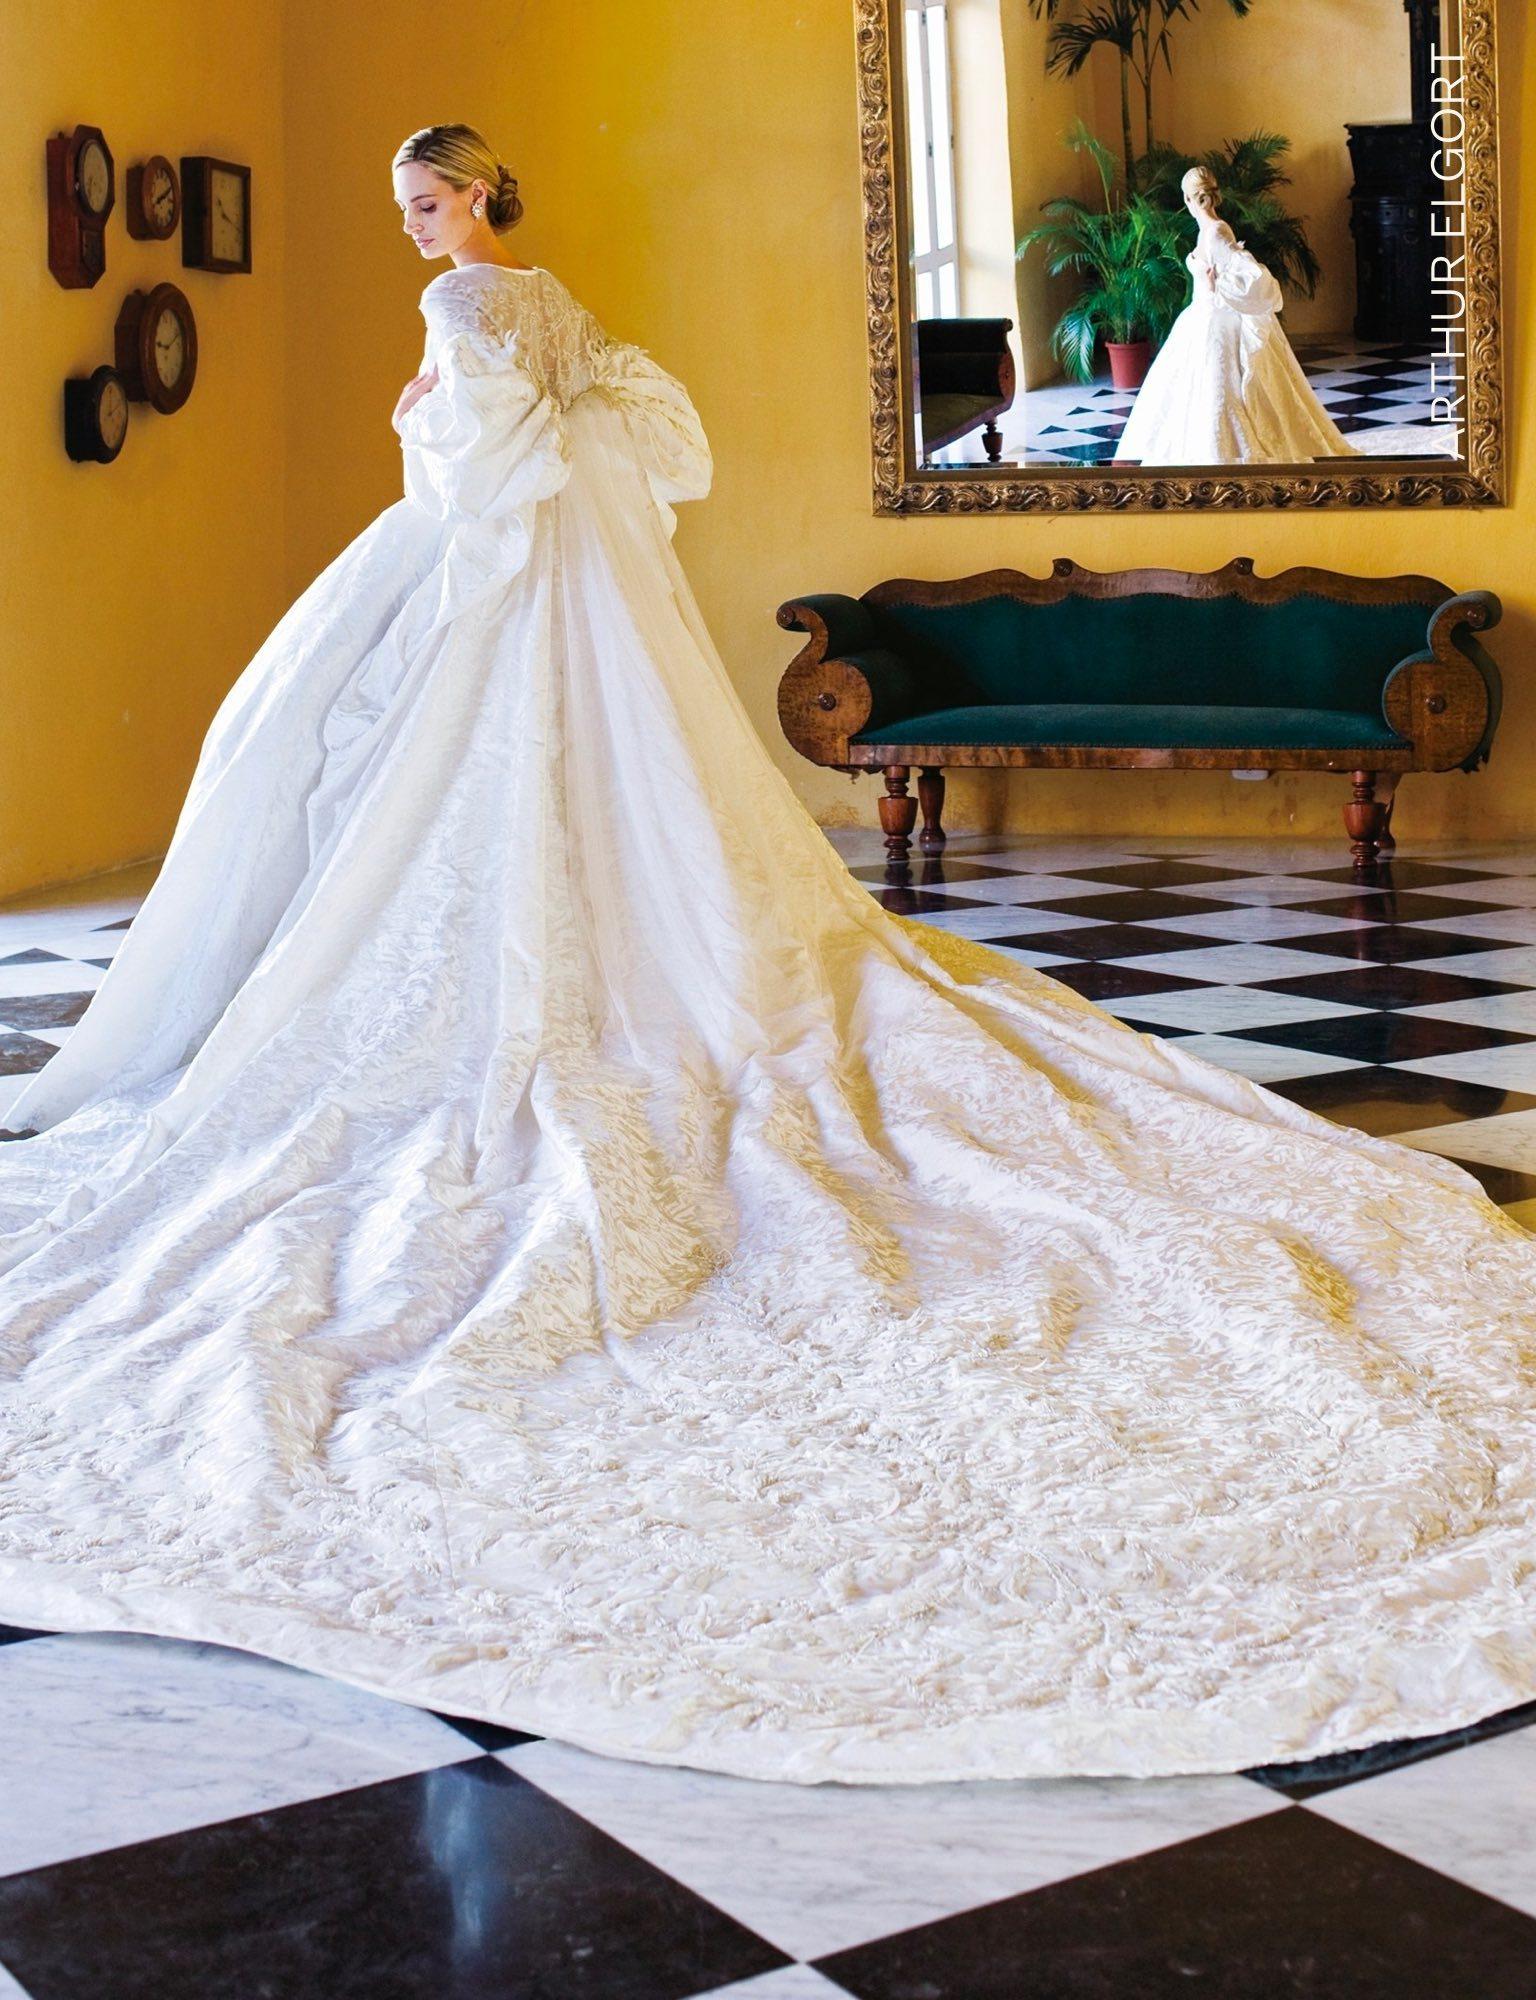 The Top Bridal Trends Of 2020 Moda Operandi